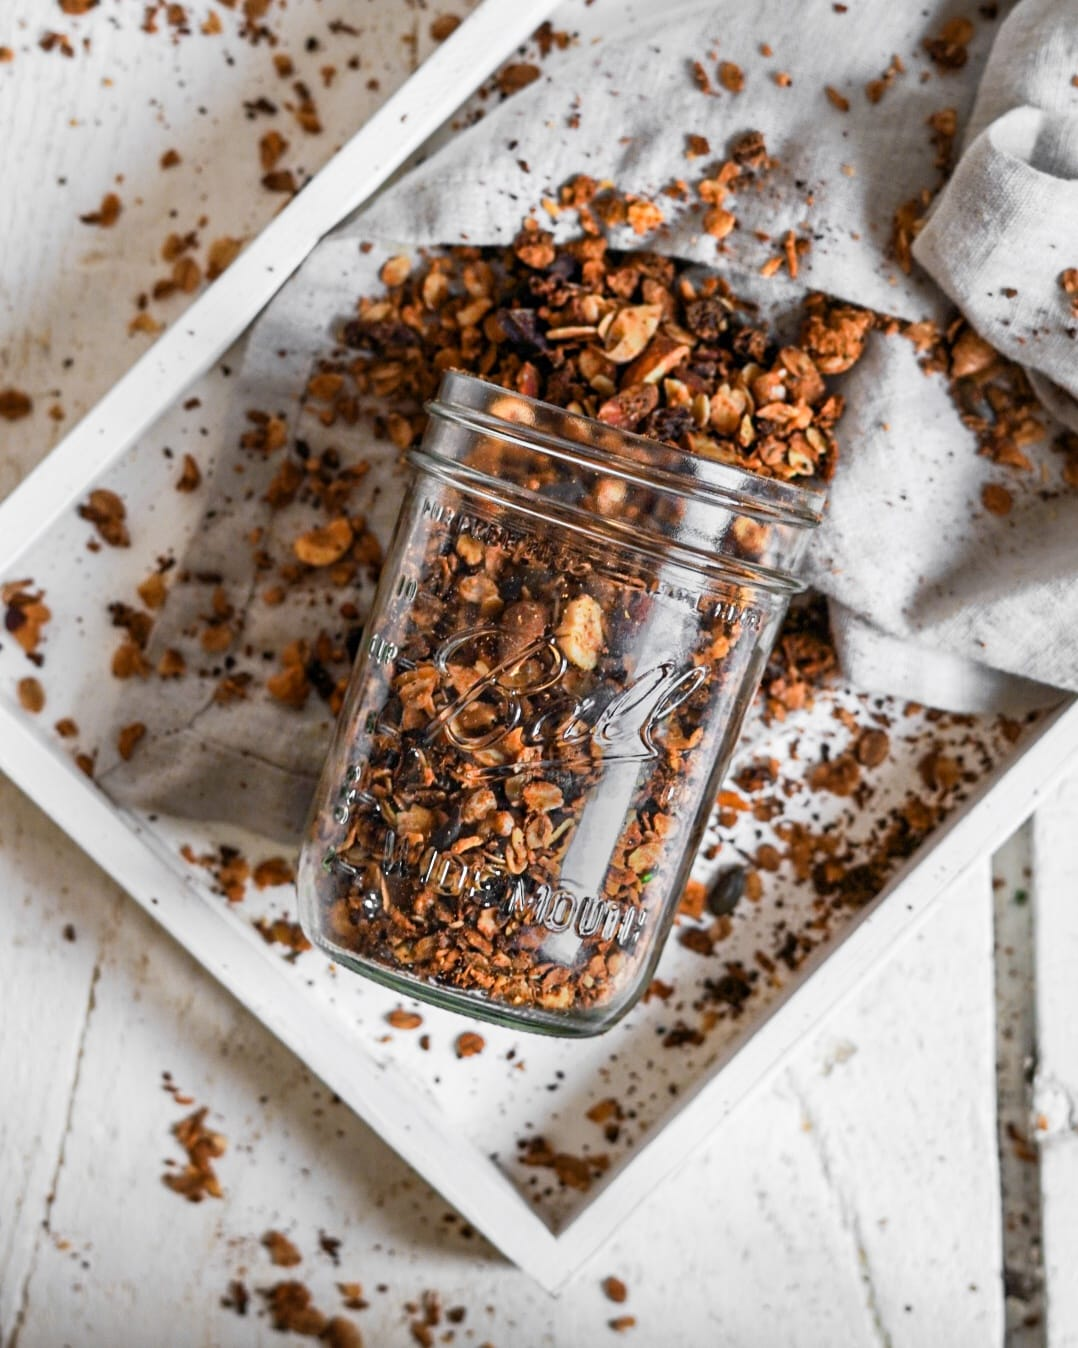 Comment faire son propre granola ?